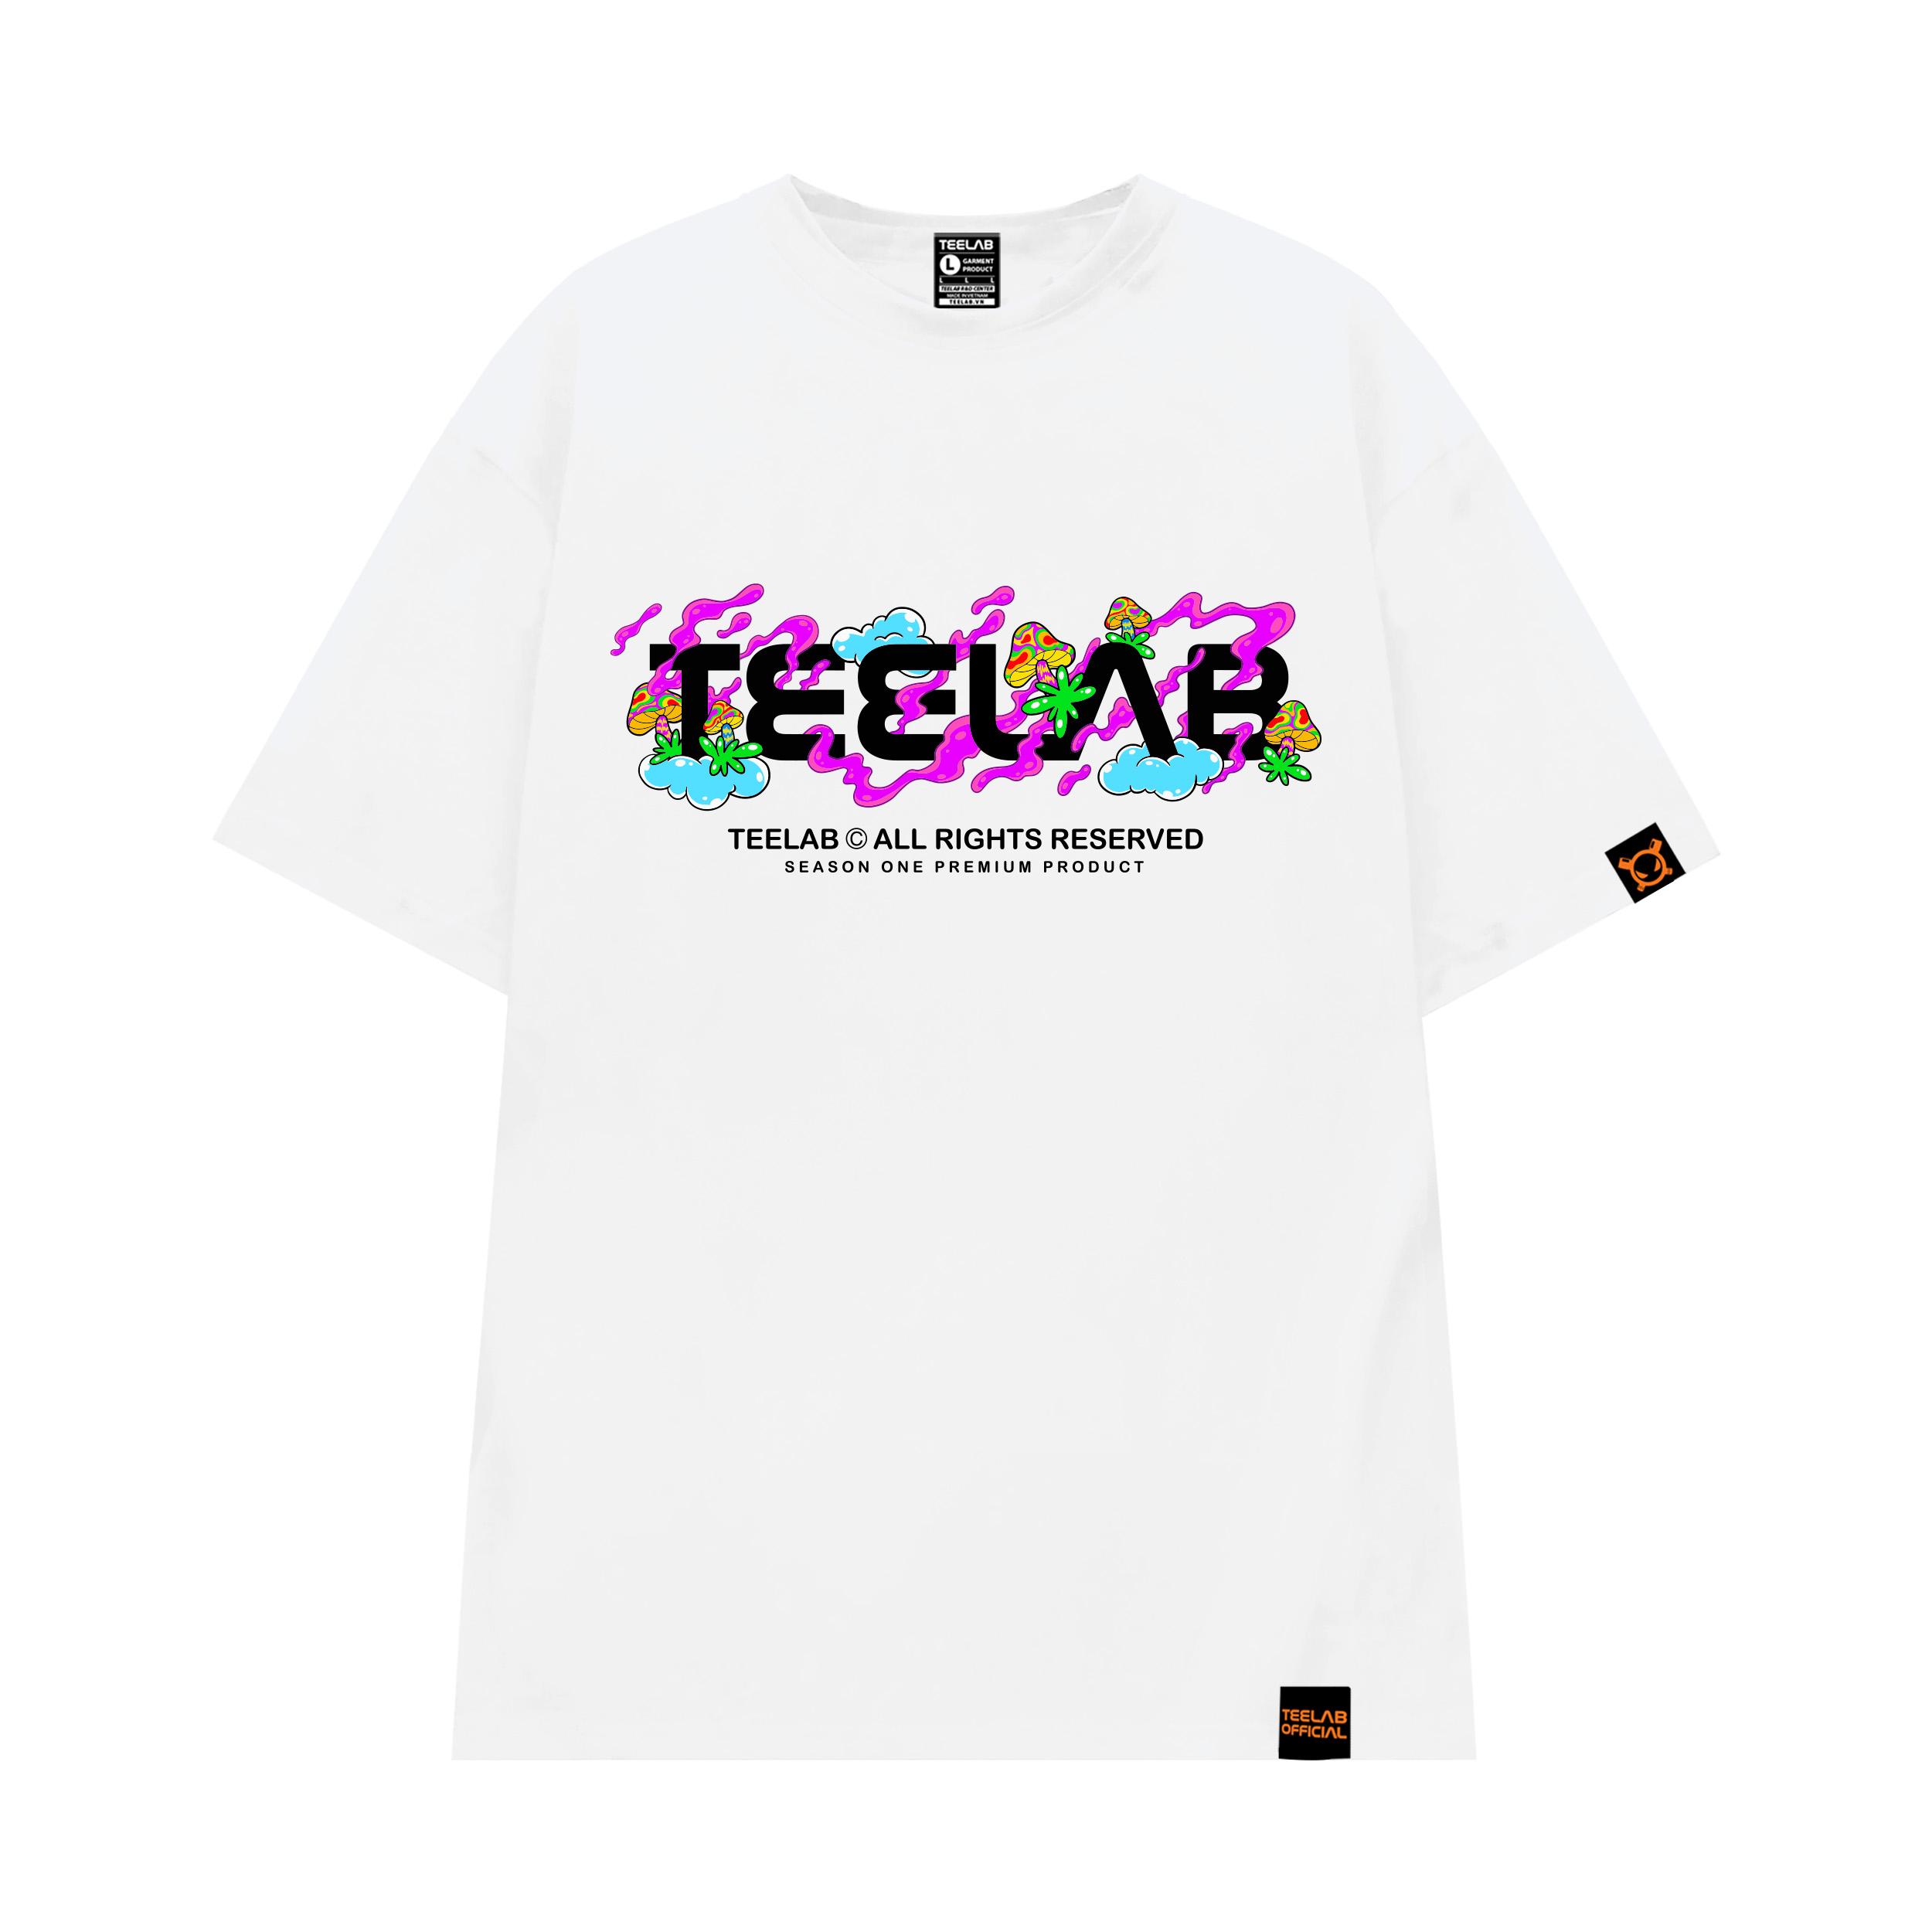 Áo thun Teelab MUSHROOM CLUB TS051